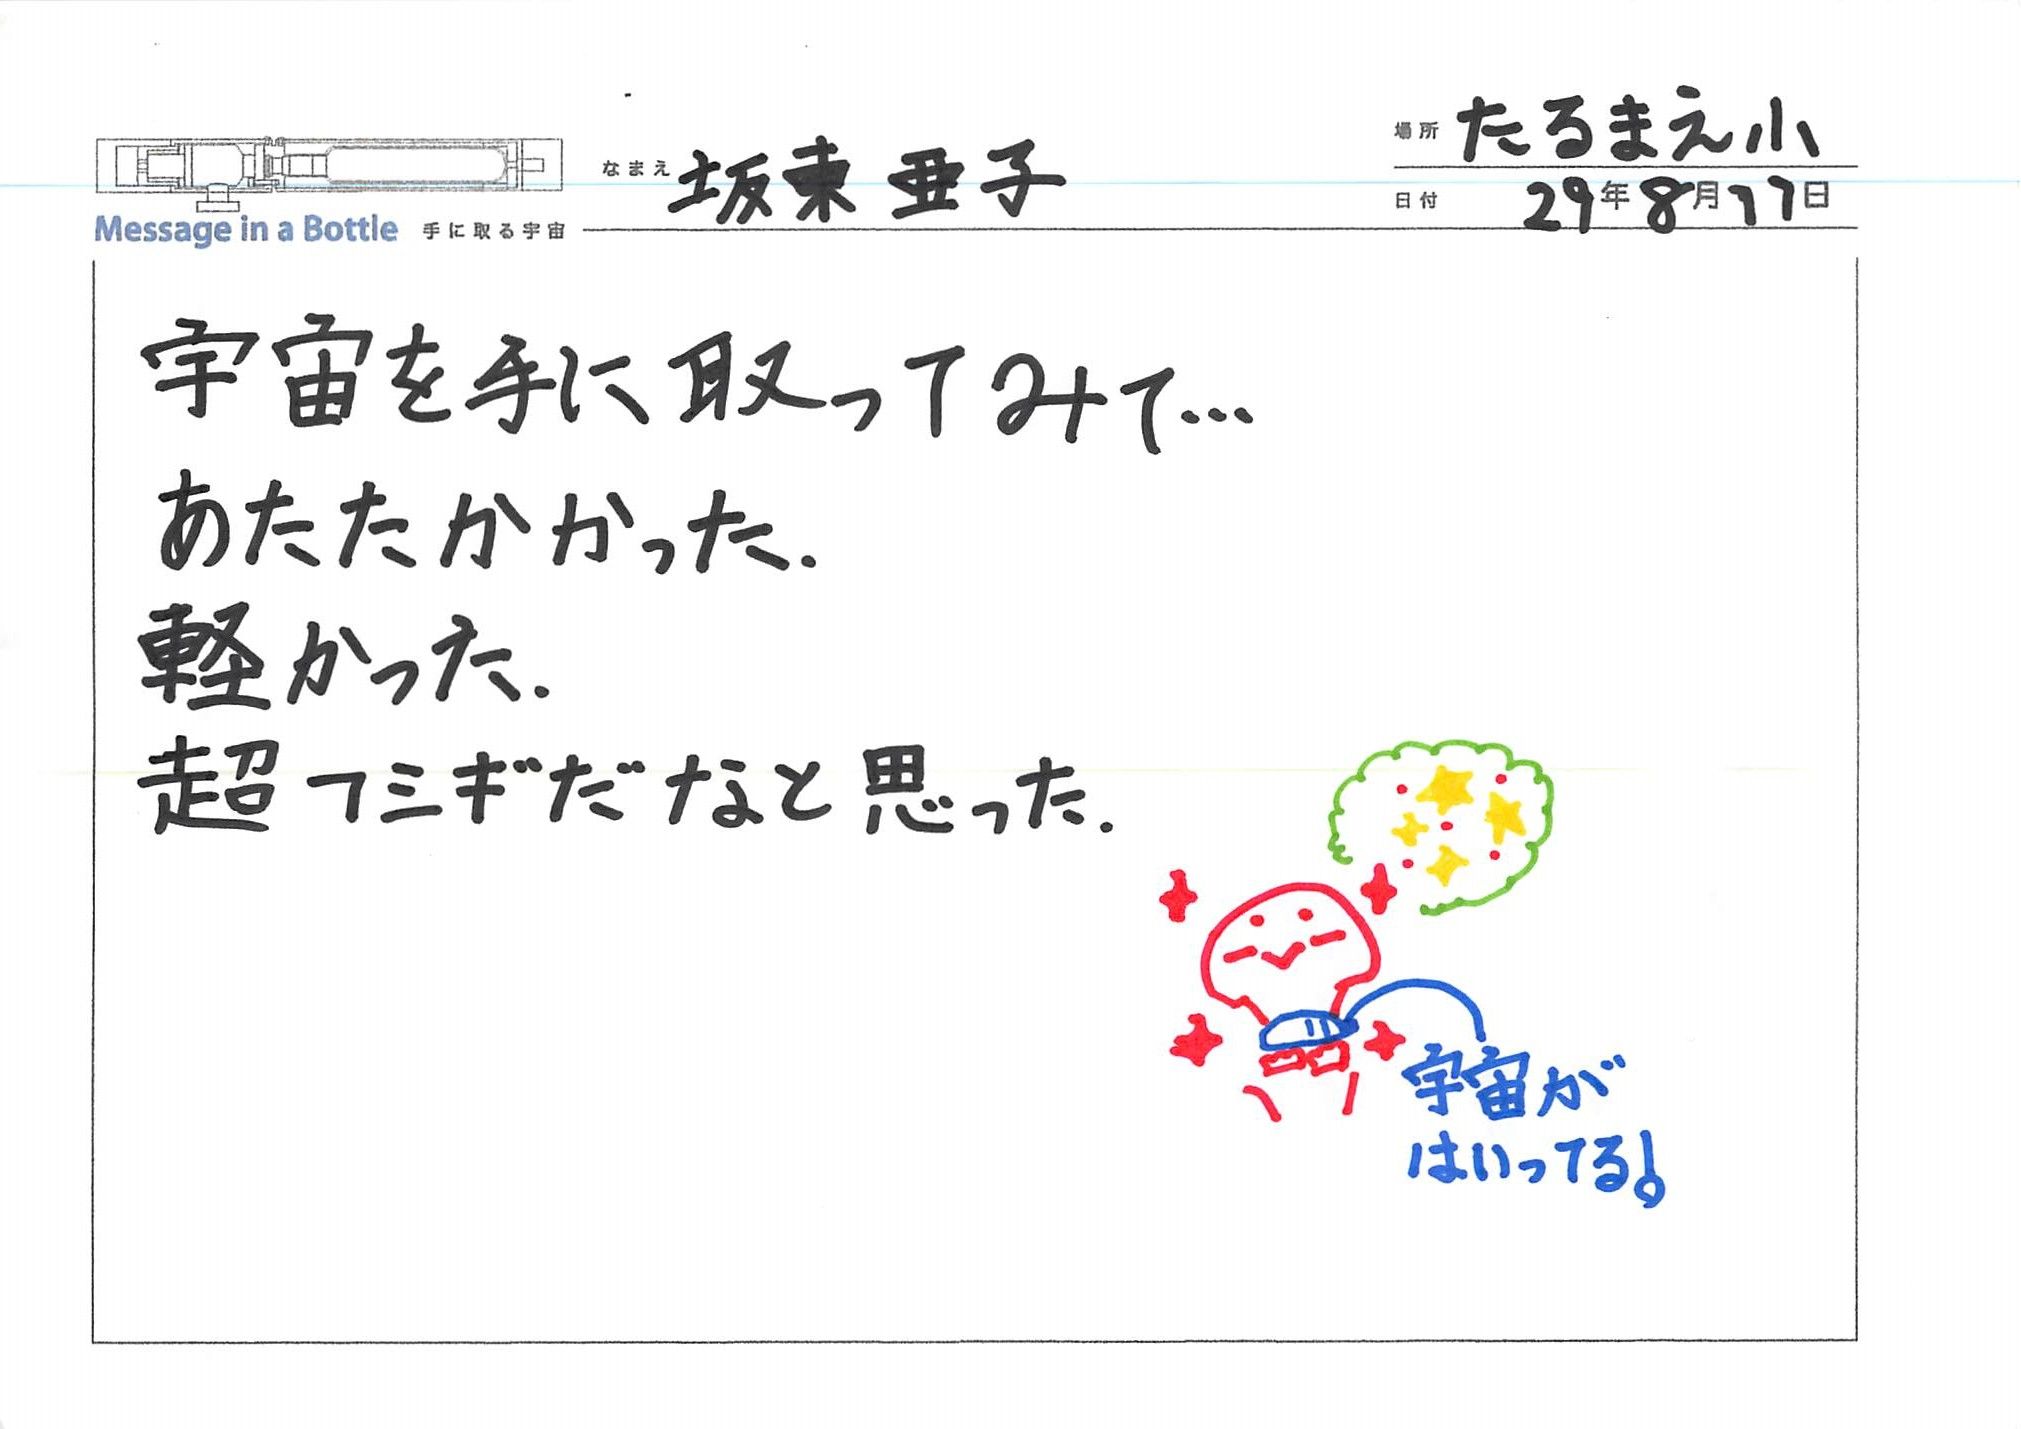 2017-08-11-19-01-03